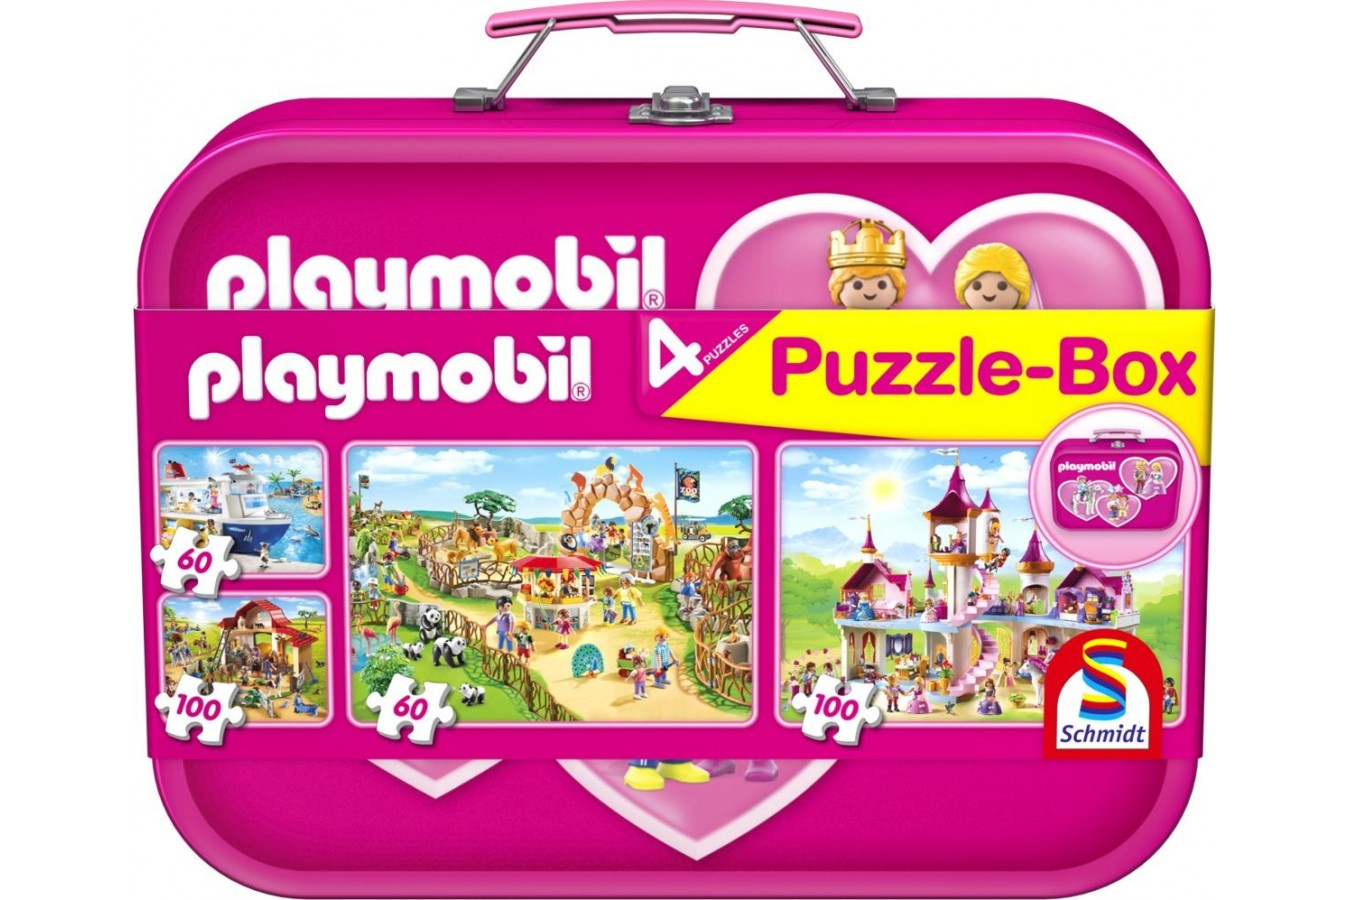 Puzzle Schmidt - Playmobil Pink, 2x60 + 2x100 piese, cutie metalica (56498) imagine